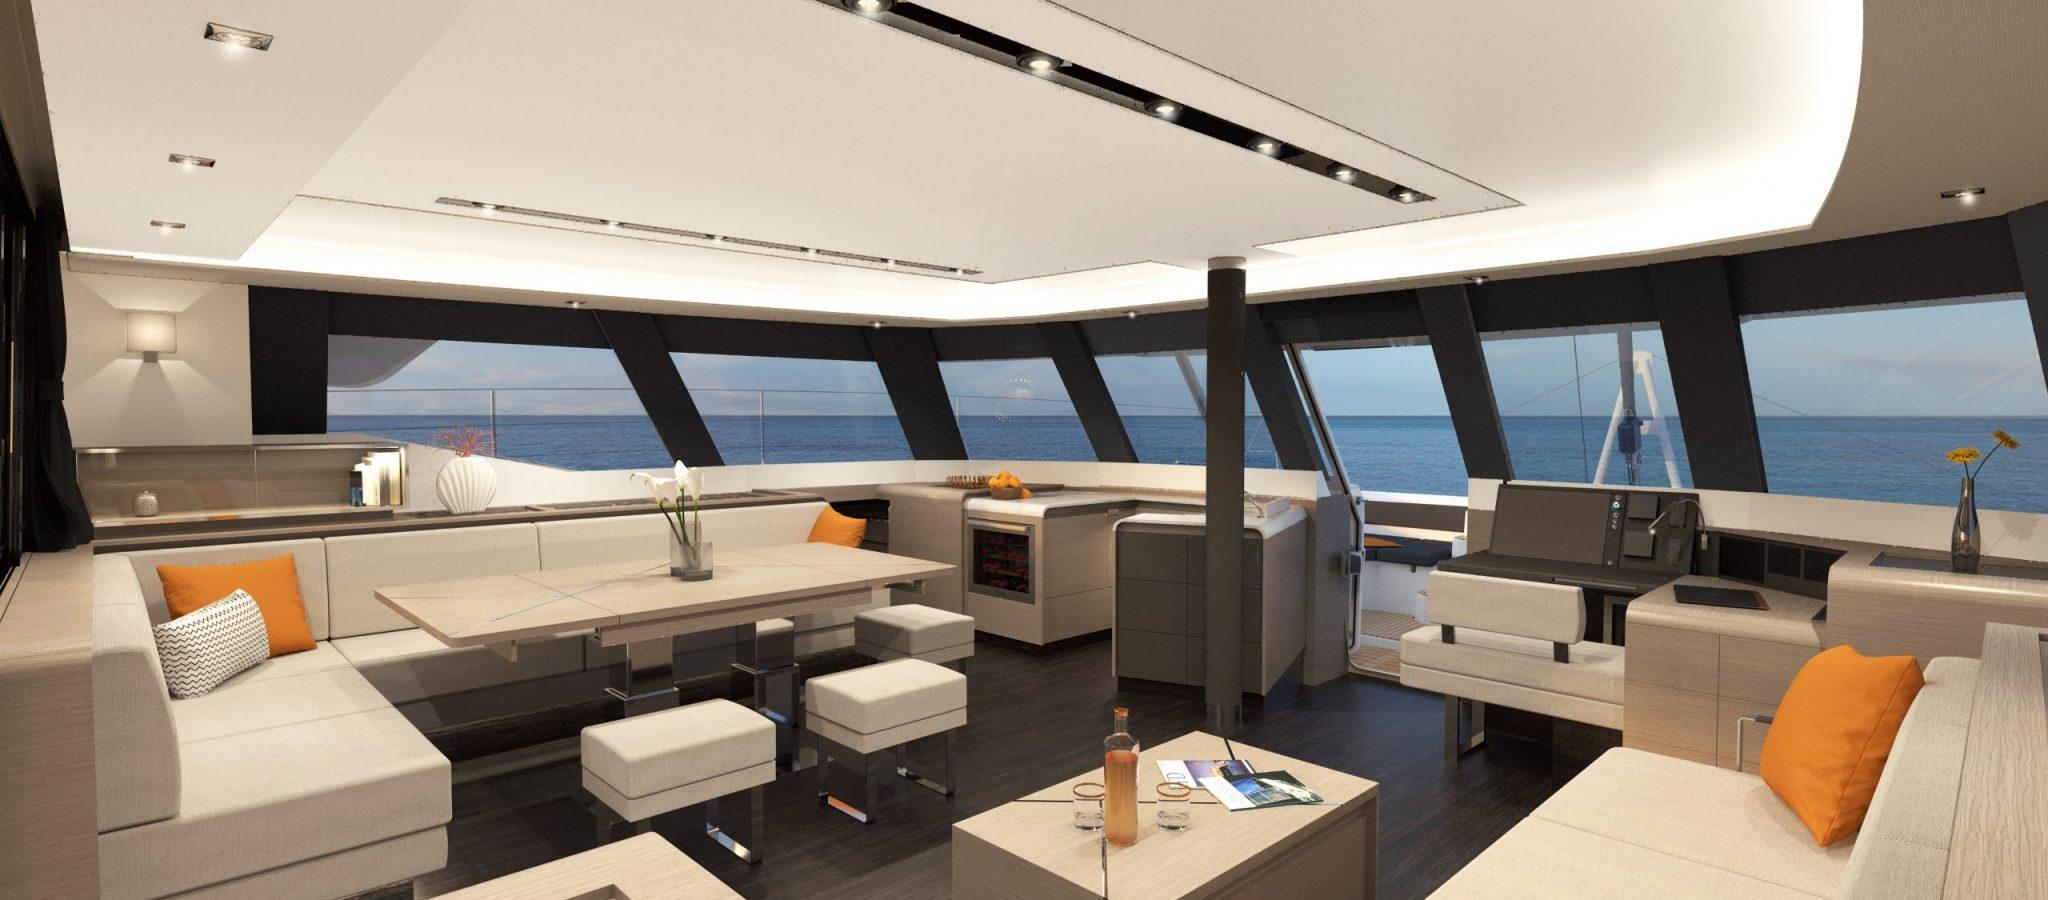 Samana-59-Fountaine-Pajot-Sailing-Catamarans_maestro-cabin_Interior-006--5-